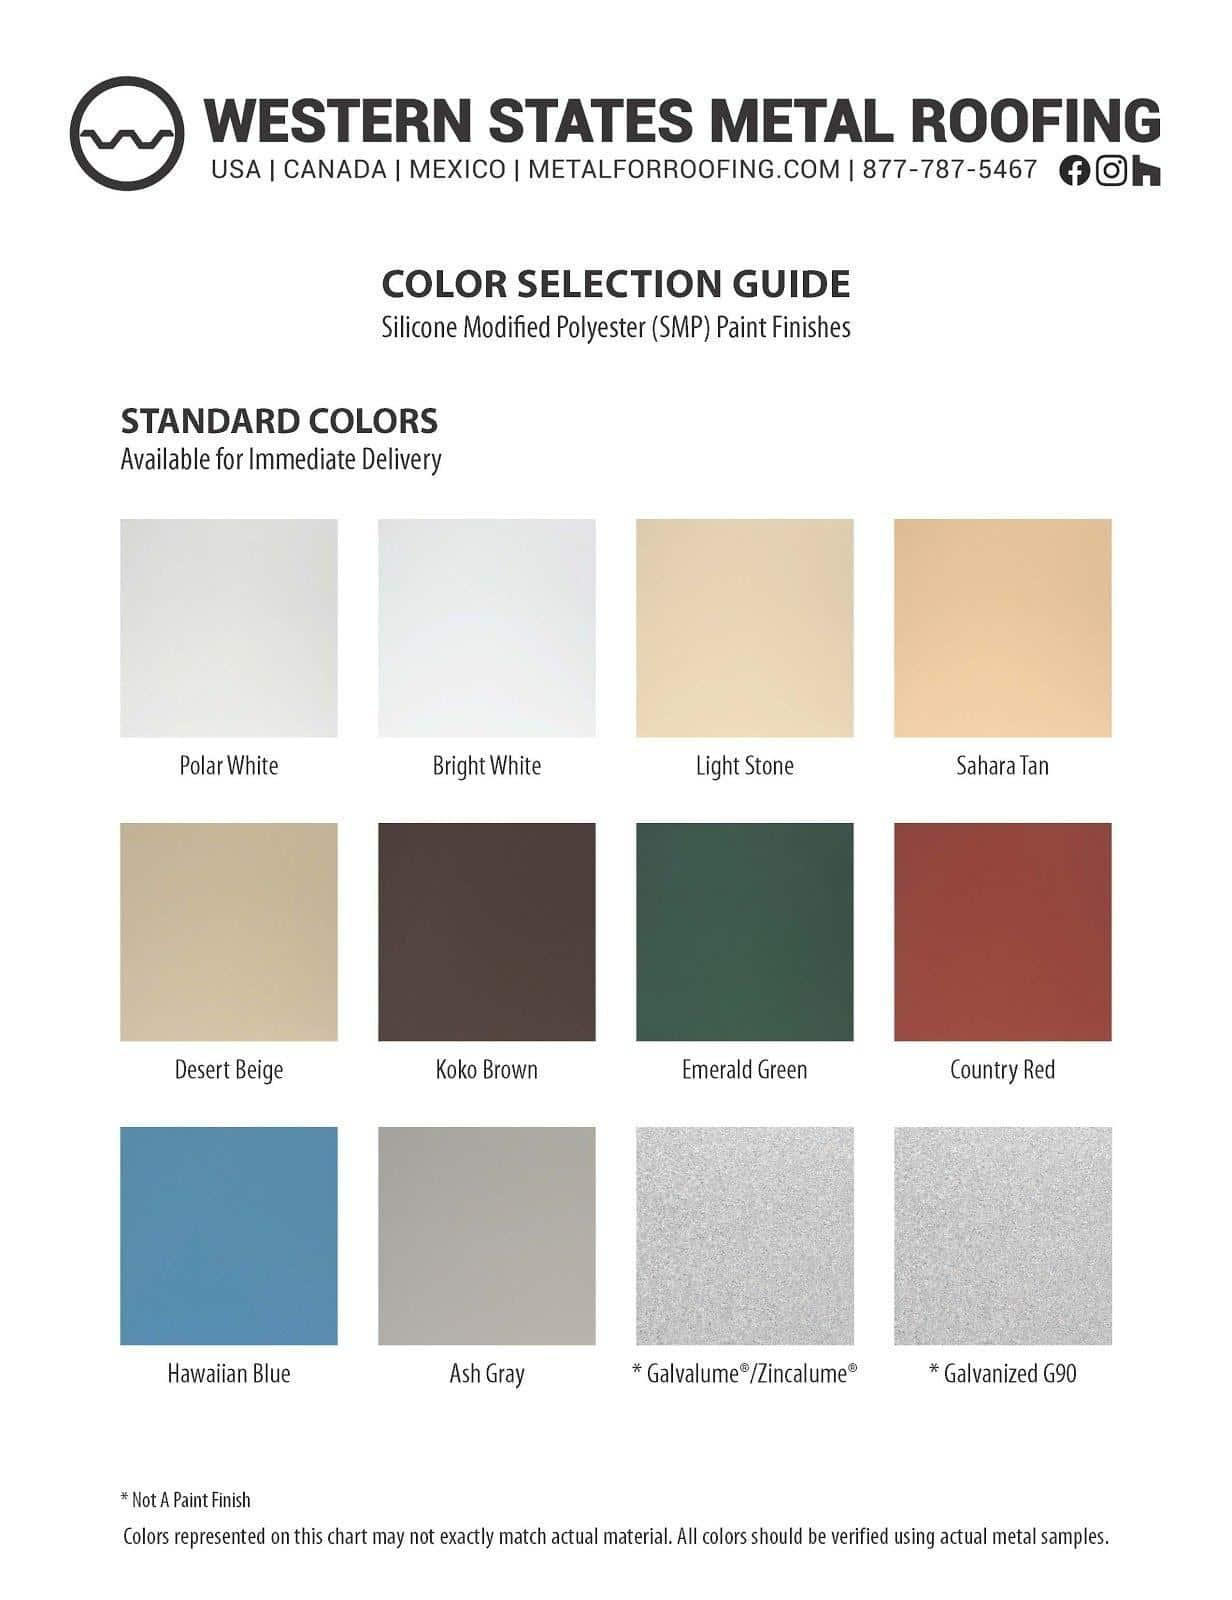 SMP Color Card- Standard Colors